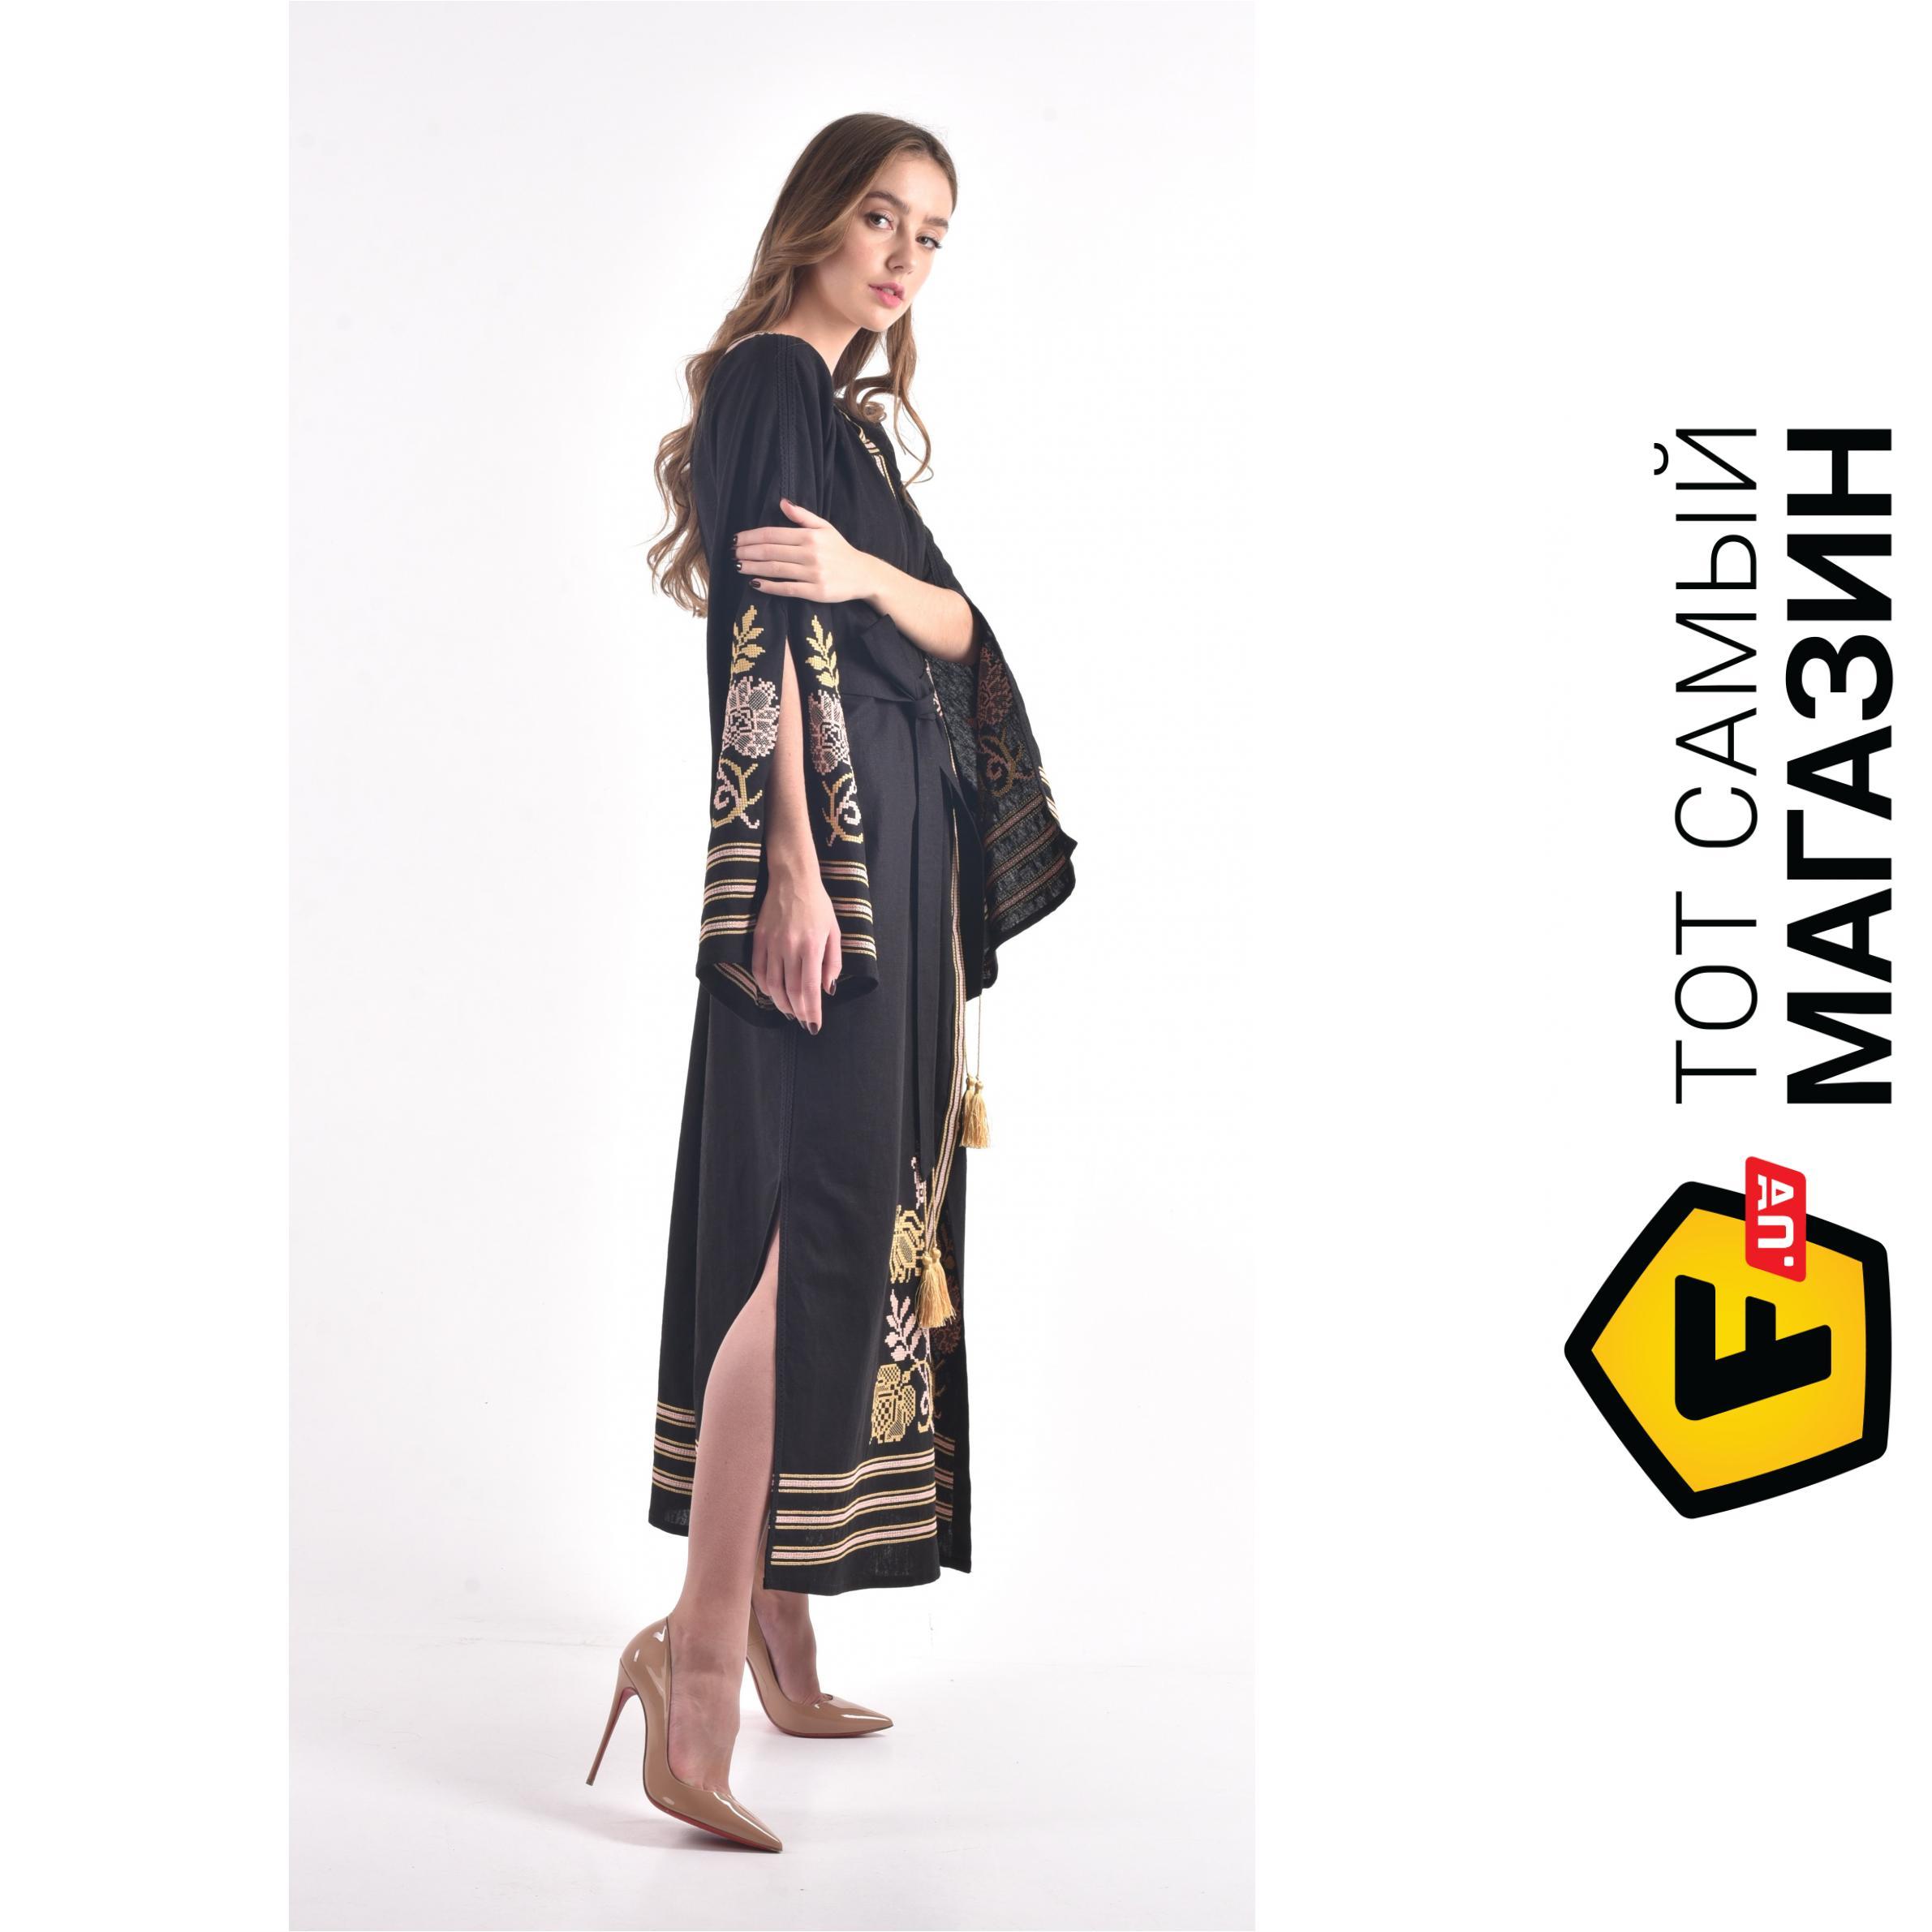 22e5a14a2e6 ᐈ Платье-вышиванка 2KOLYORY ``Княжна`` M-L Черный ~ Купить  ЦЕНА ...